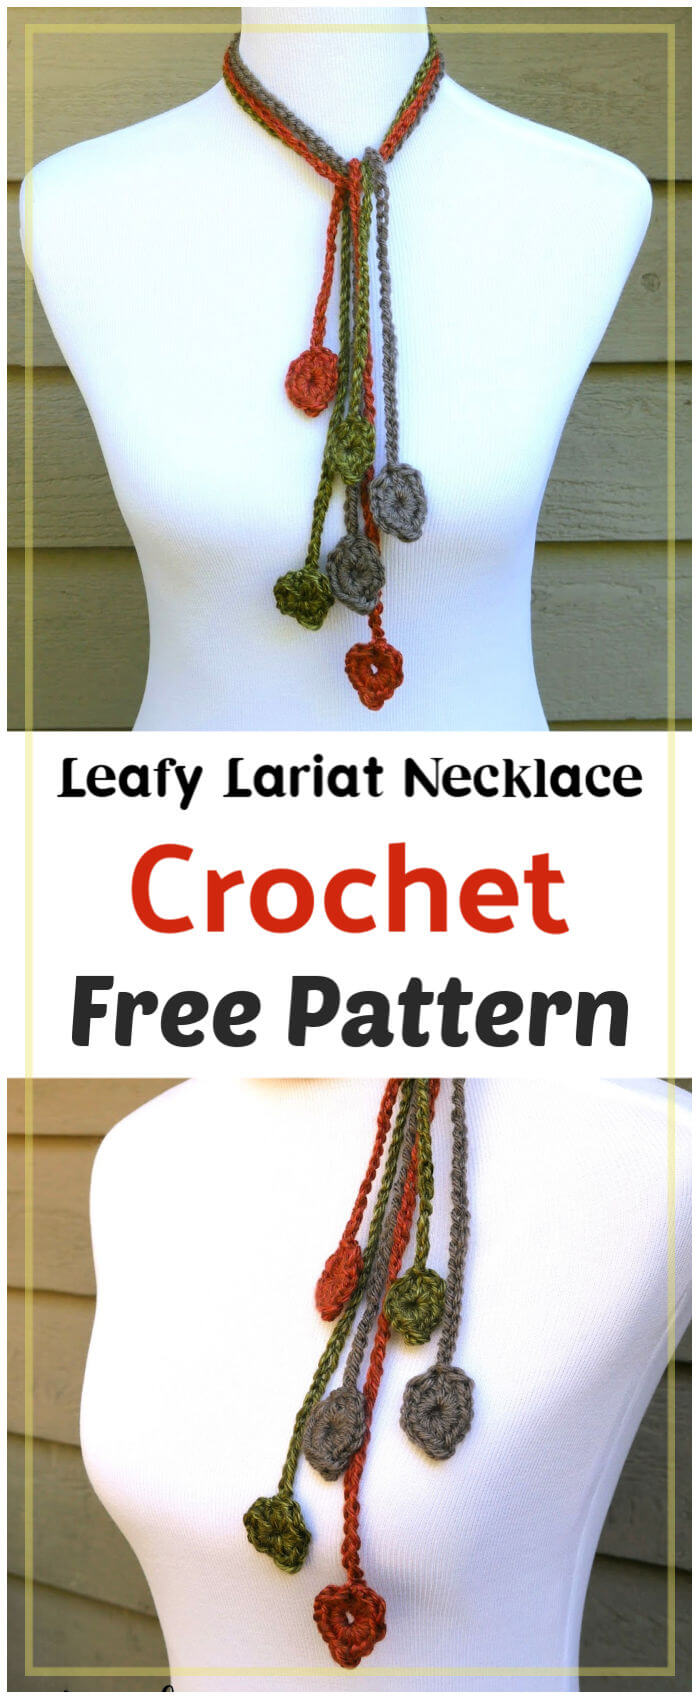 Leafy Lariat Necklace Free Crochet Pattern